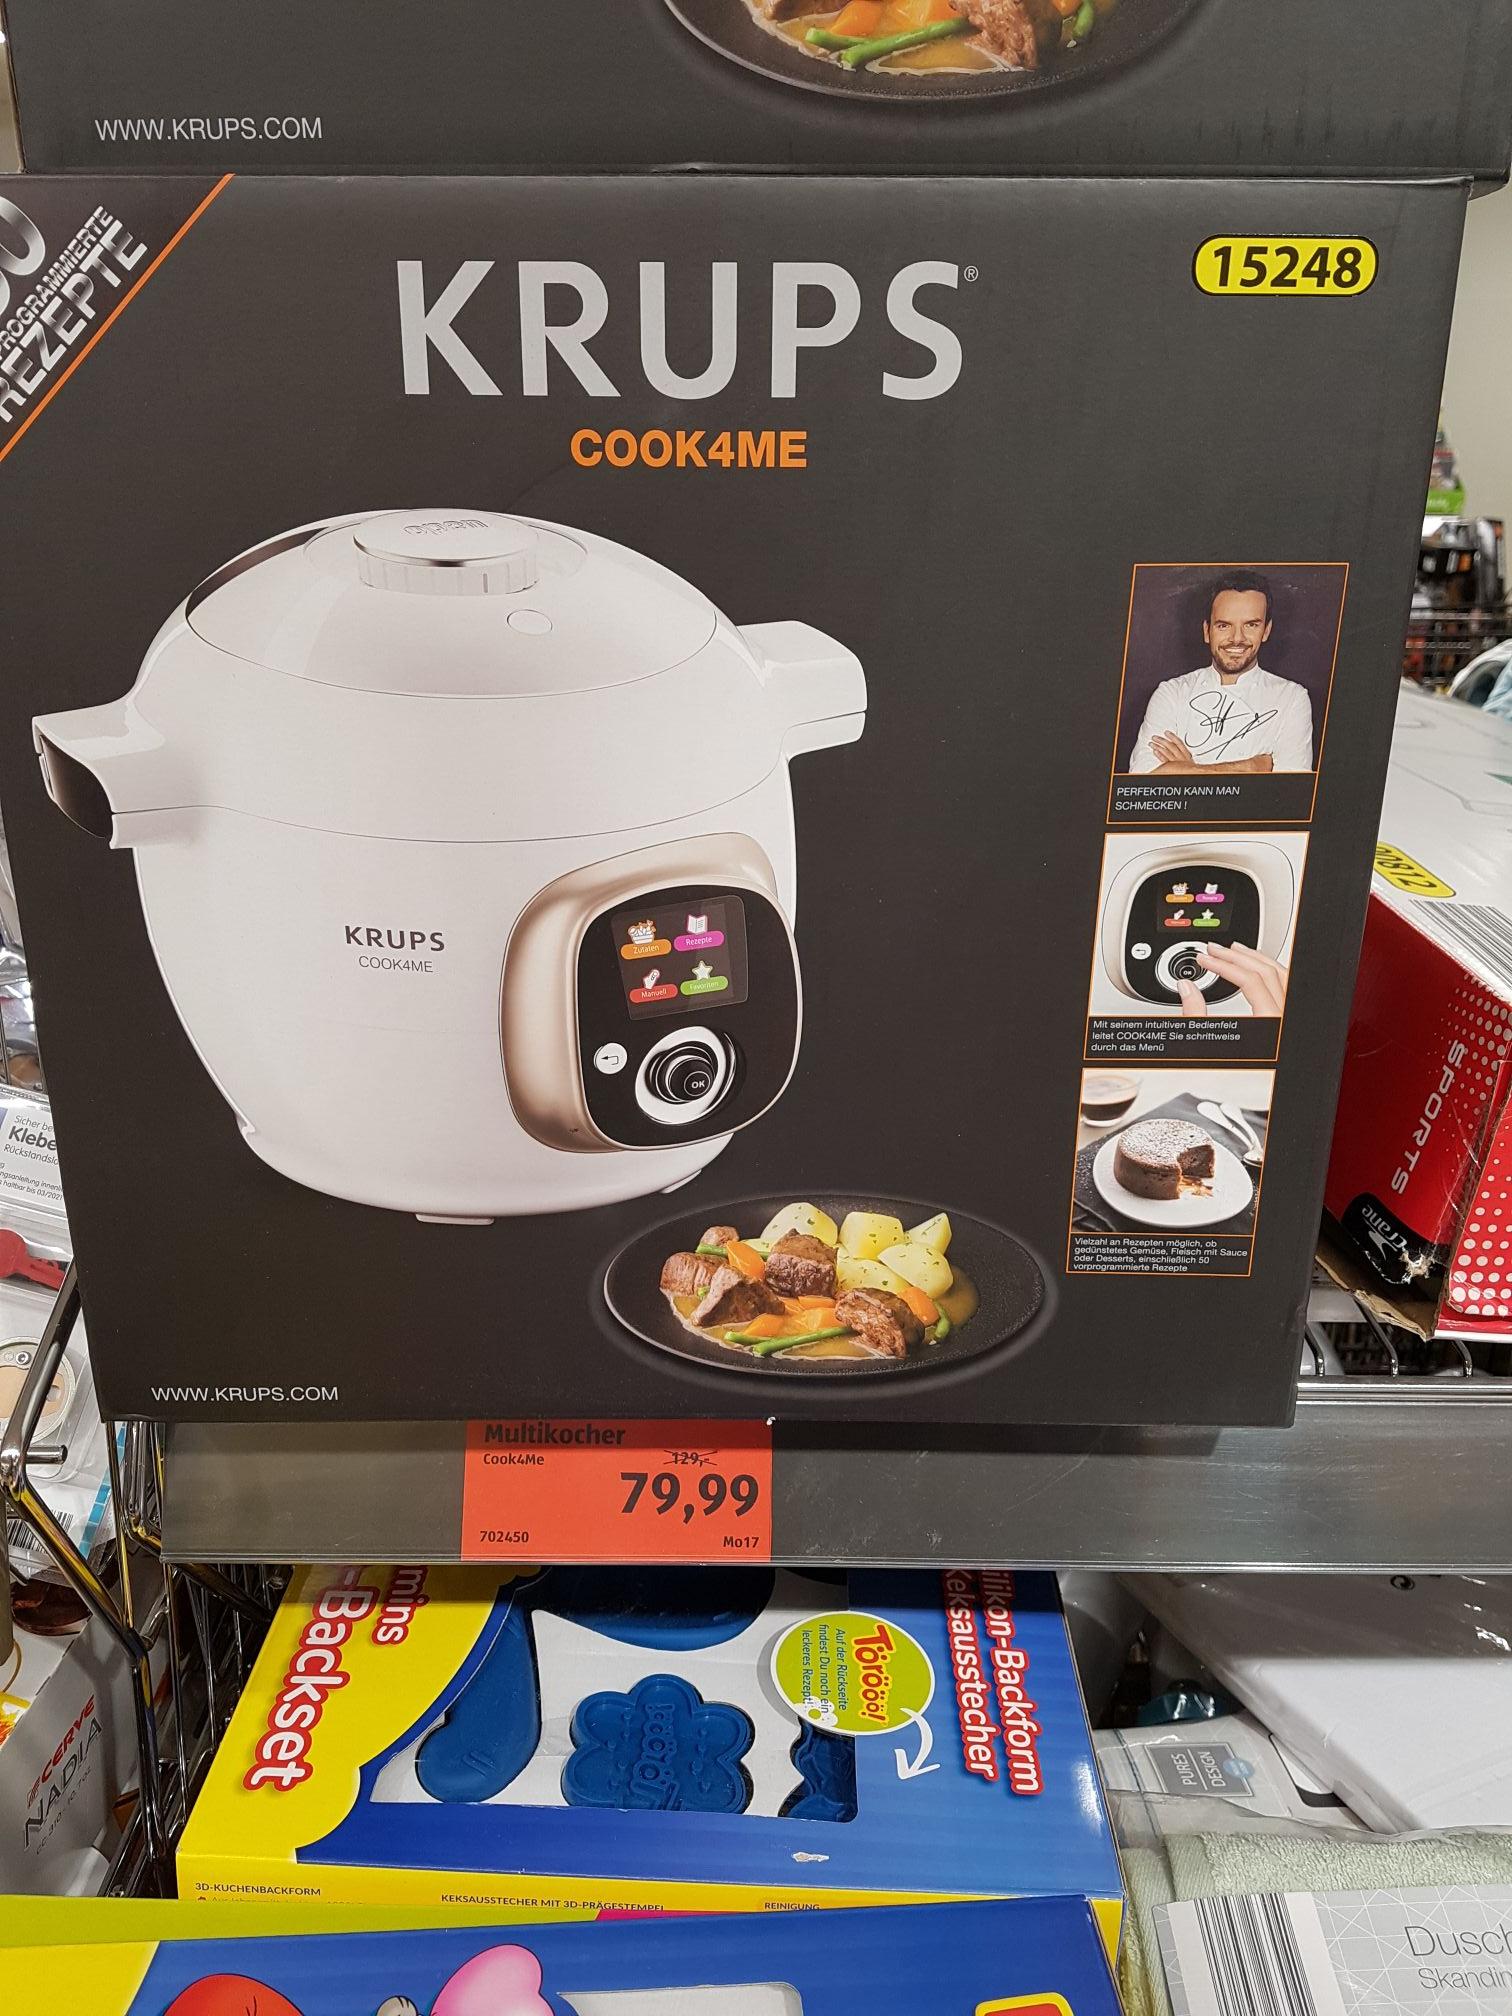 Krups Cook4me CZ7001 Lokal in Bamberg Aldi Süd